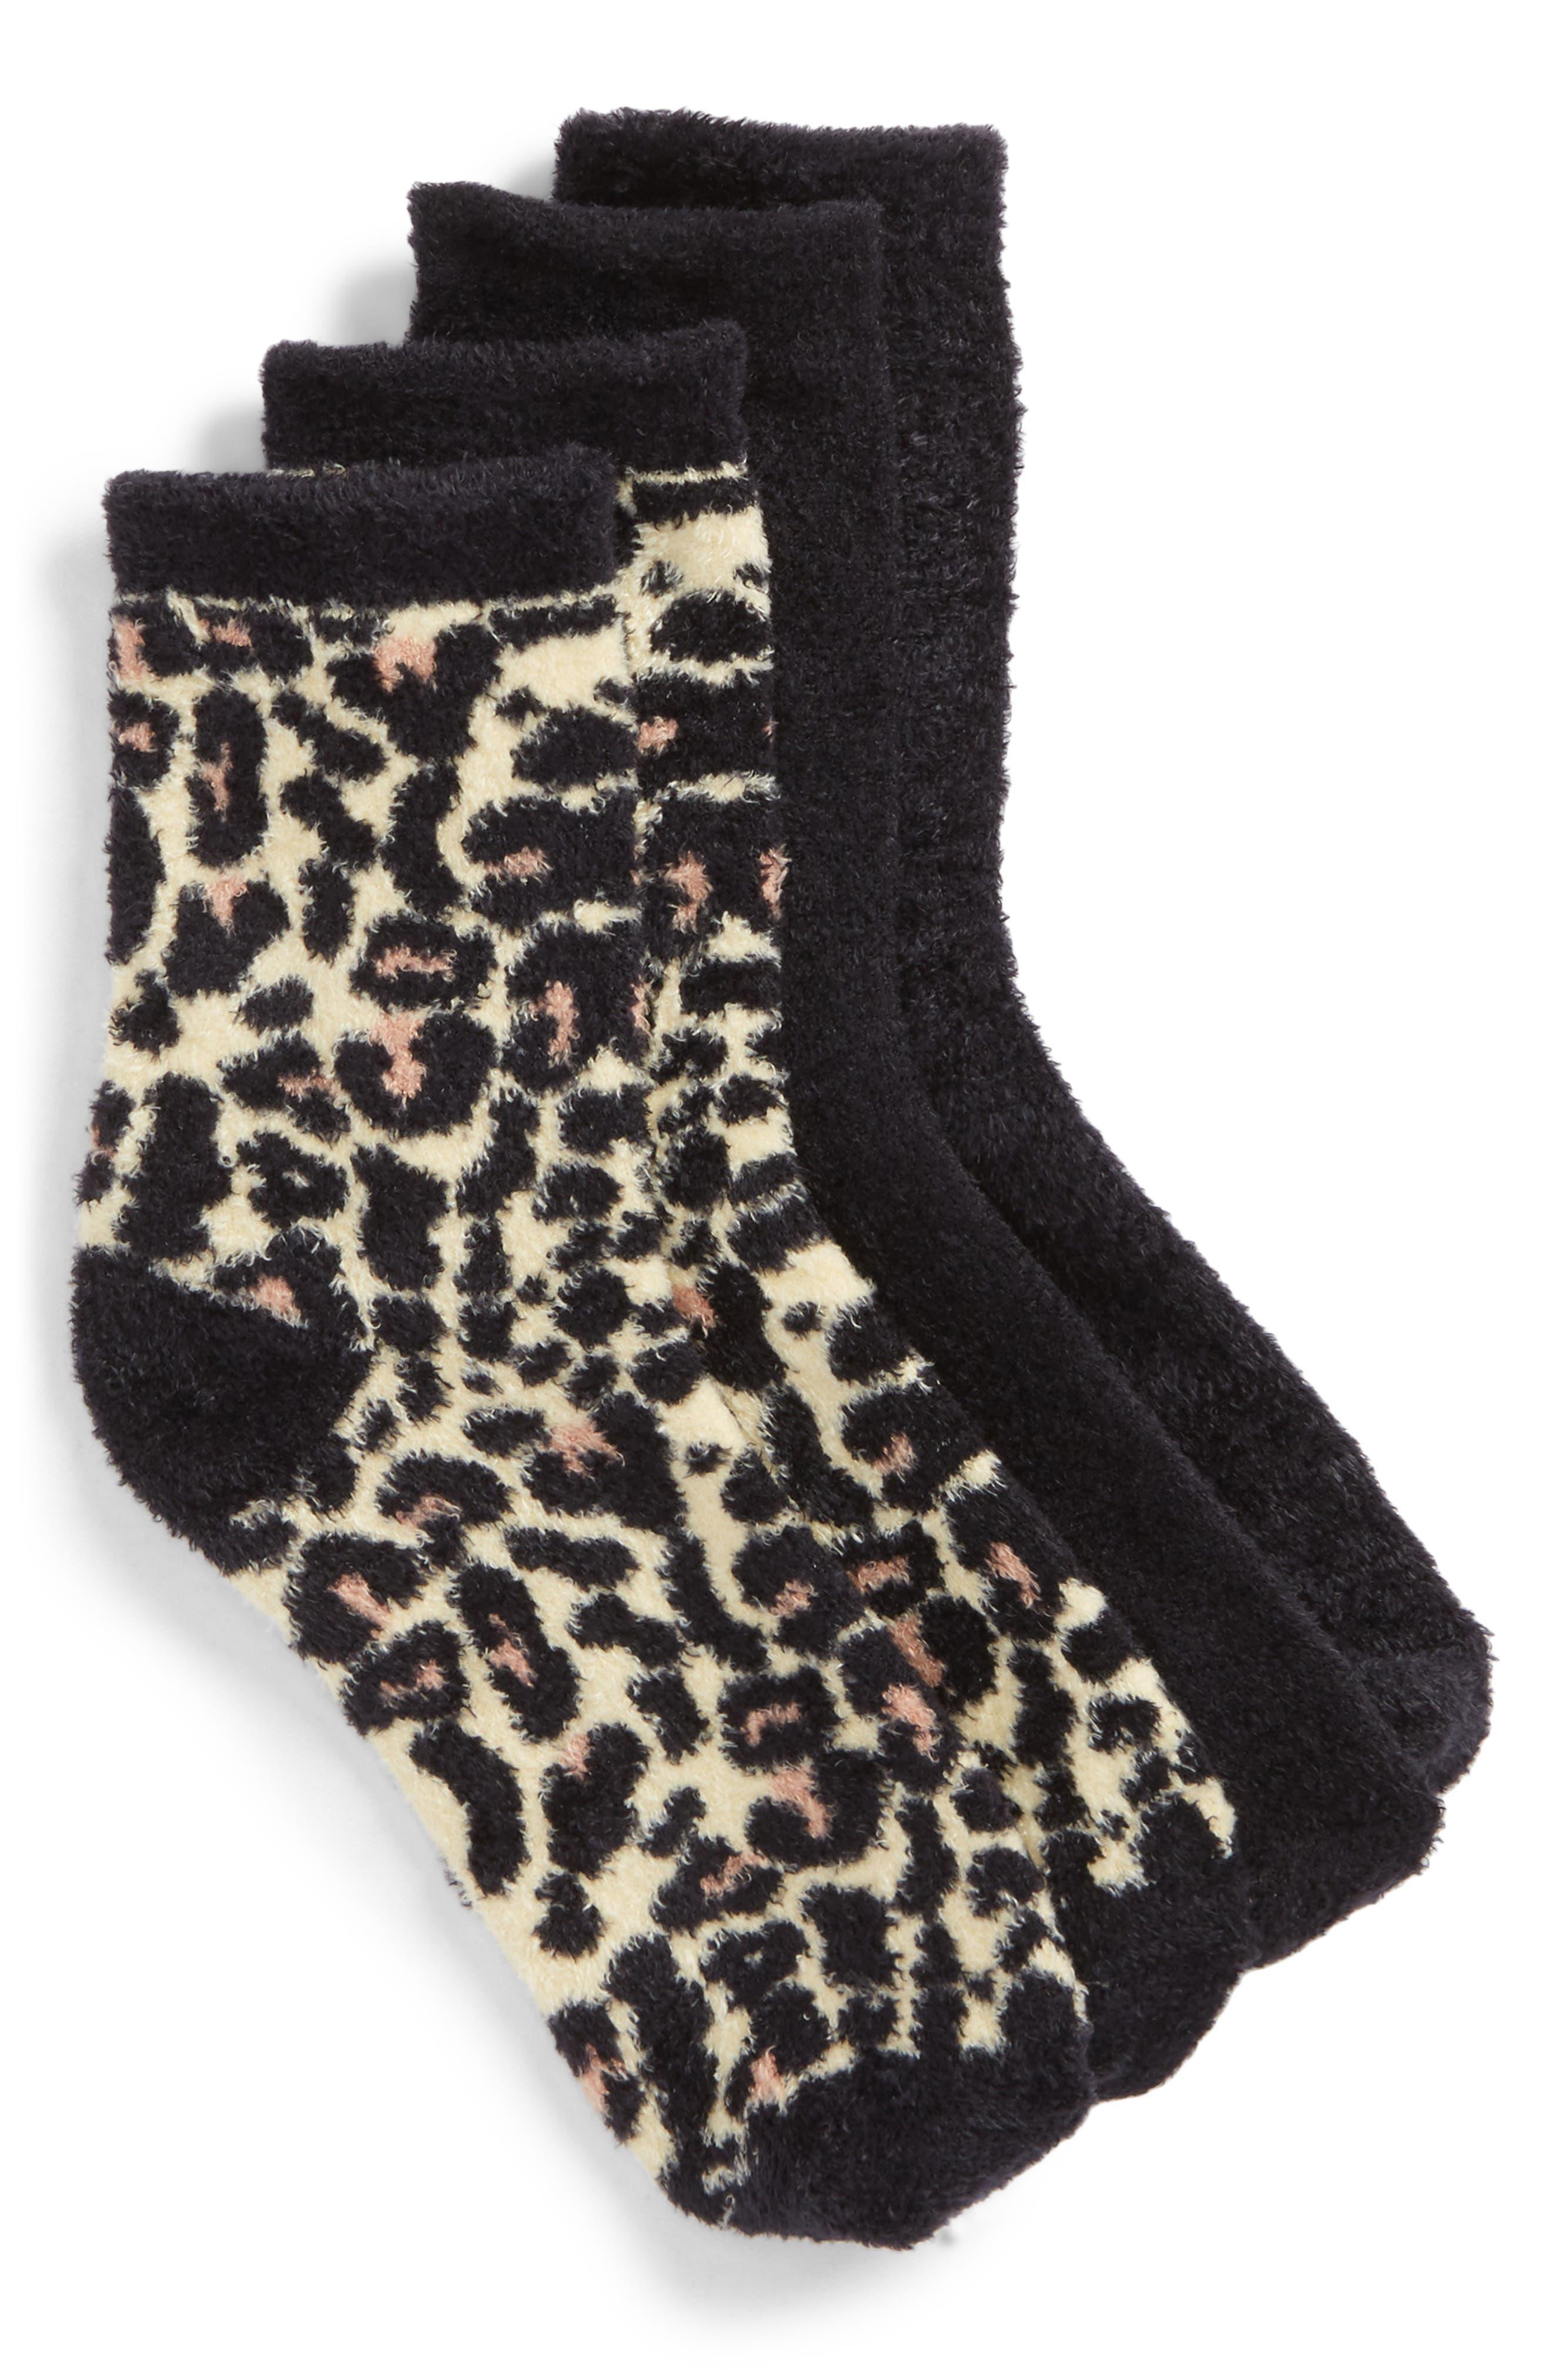 Assorted 2-Pack Butter Crew Socks,                         Main,                         color, Black/ Leopard